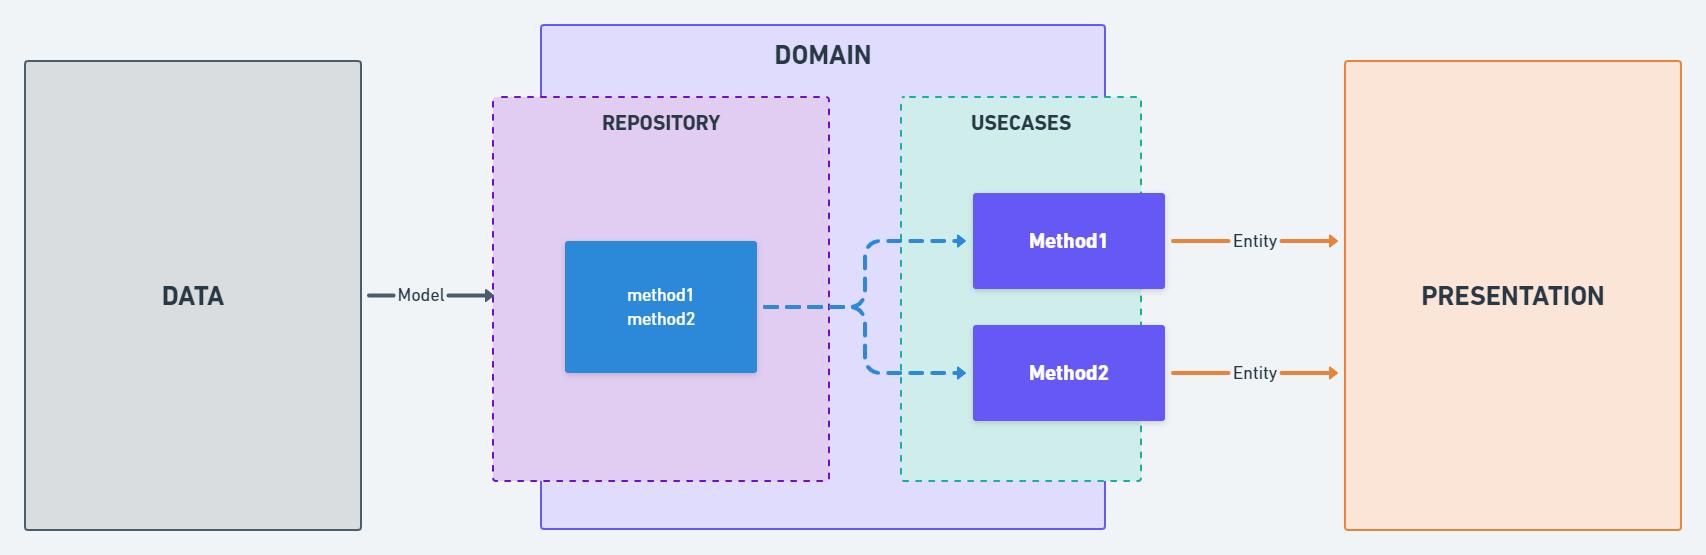 Repository-Usecases-Presentation diagram